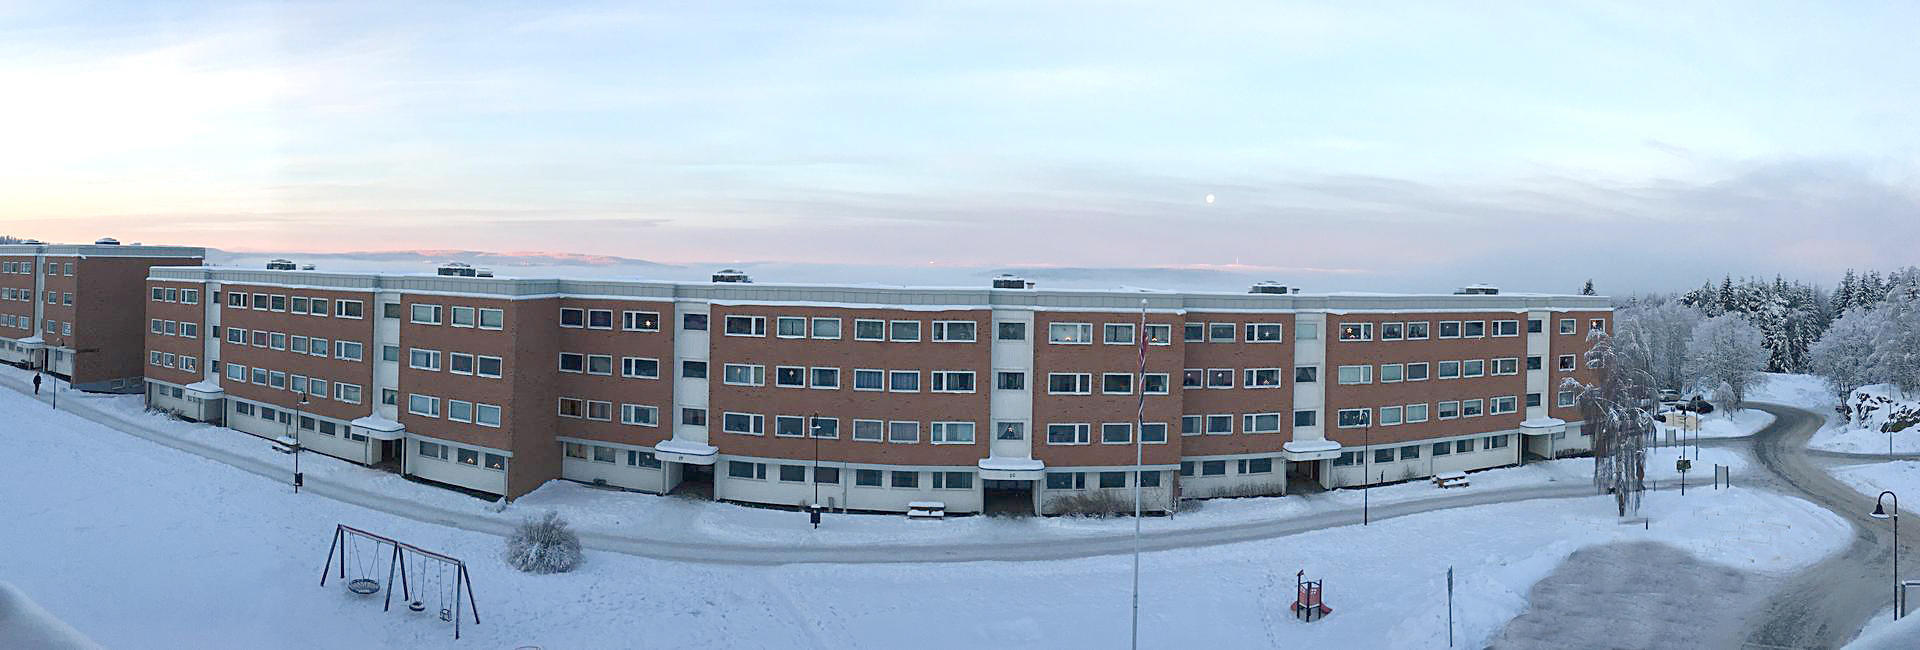 panorama1 (003).jpg